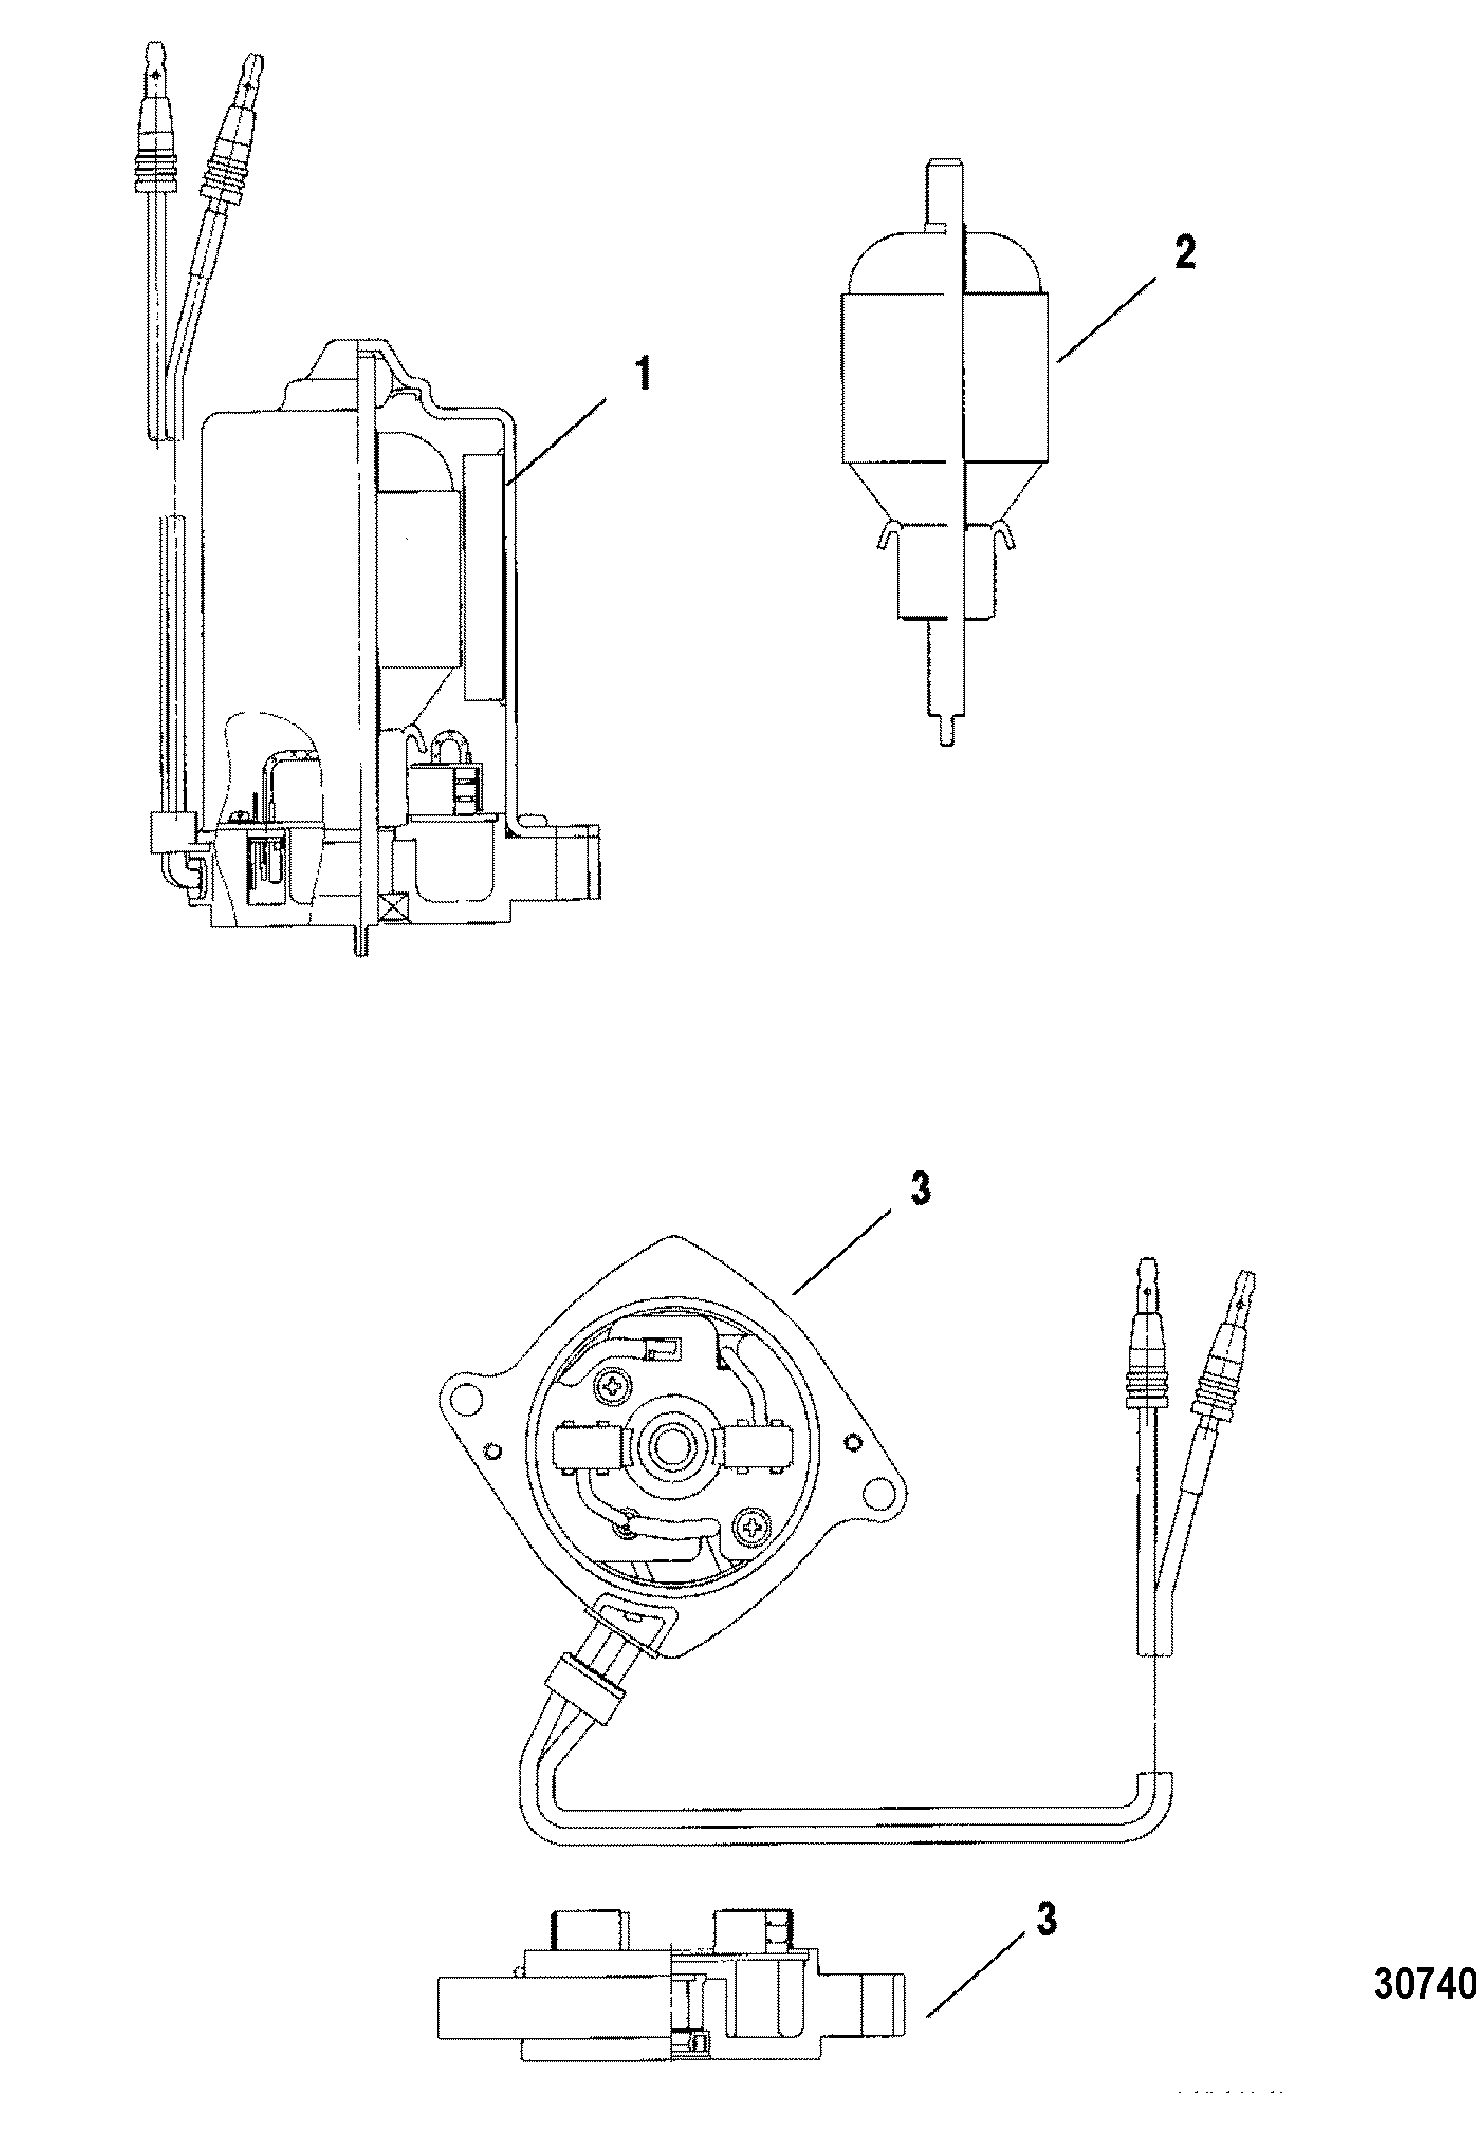 Mercury V 150 Efi 0g960500 Thru Diagram Of 8 2 Cyl2strokeinternational Outboard Power Trim Motorremoveable Pump Housing